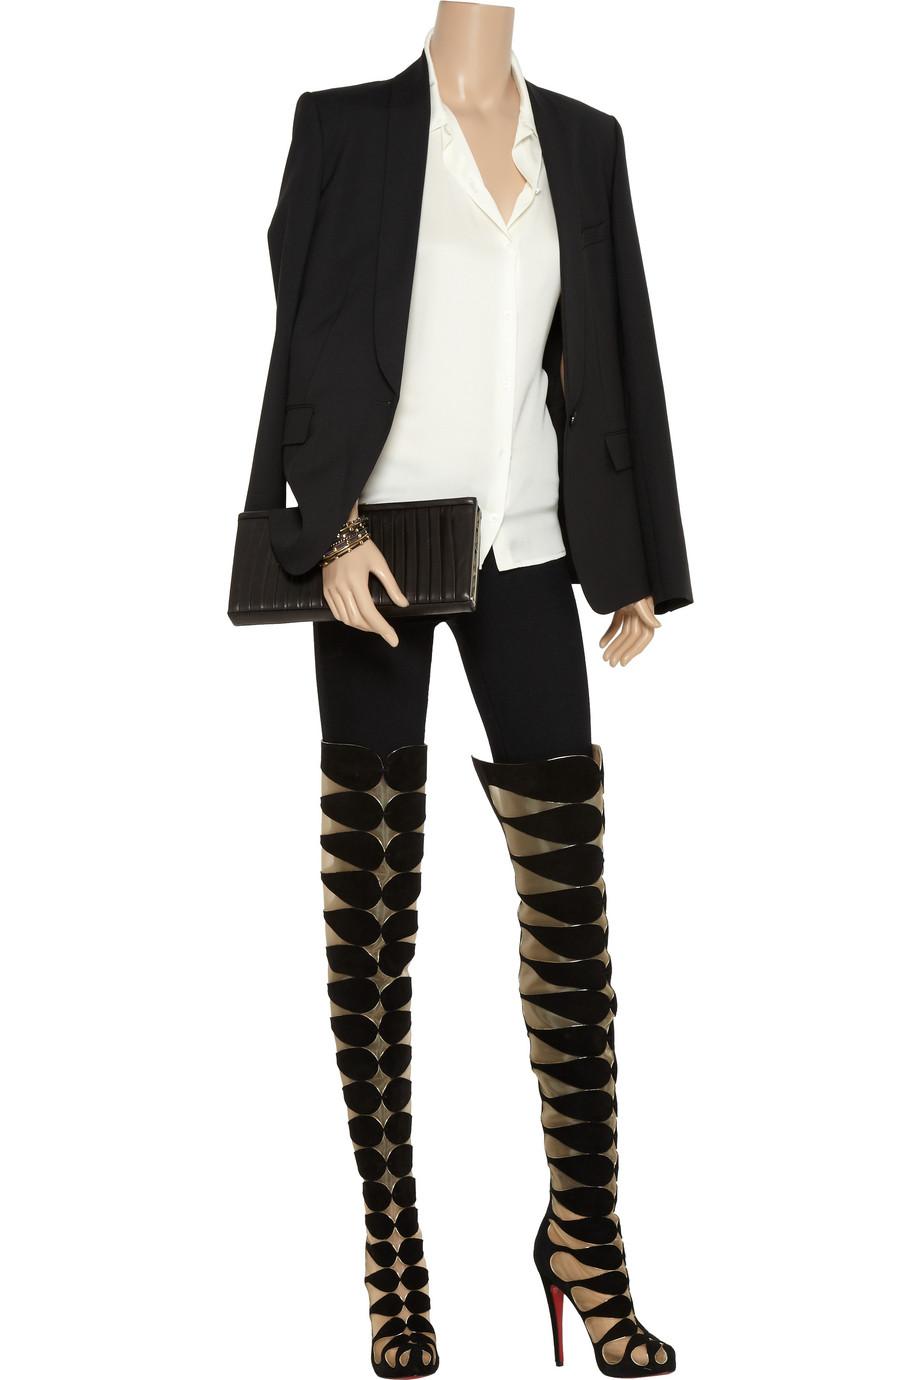 christian louboutin cutout thigh high boots